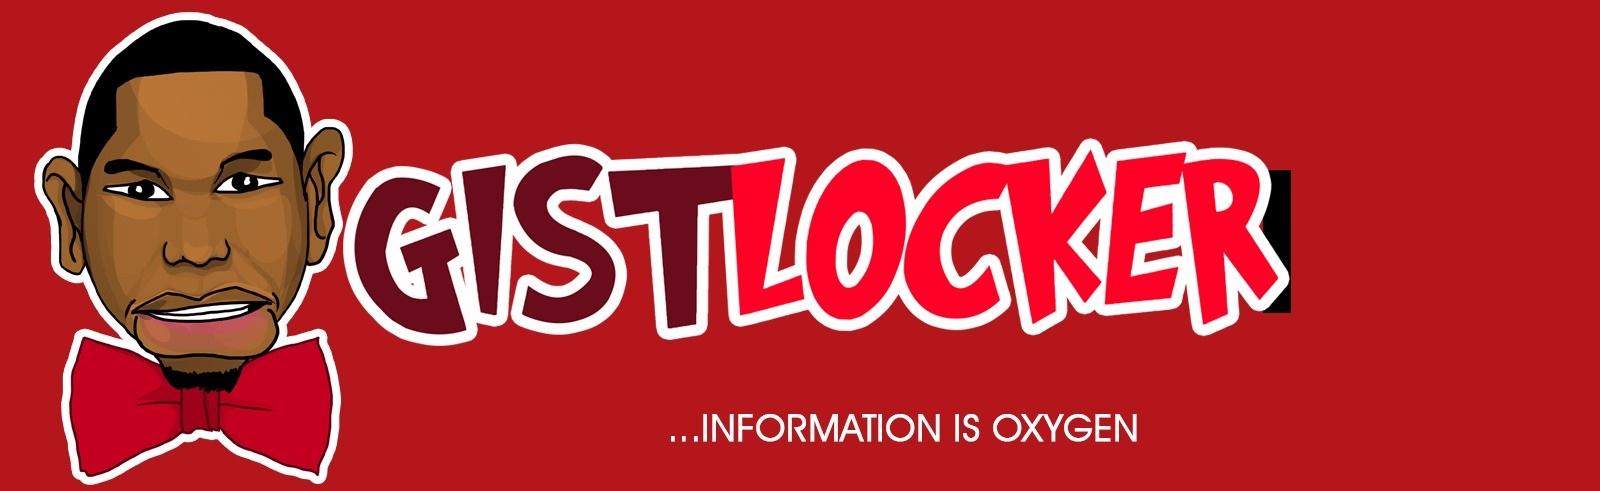 GistLocker | Information Is Oxygen